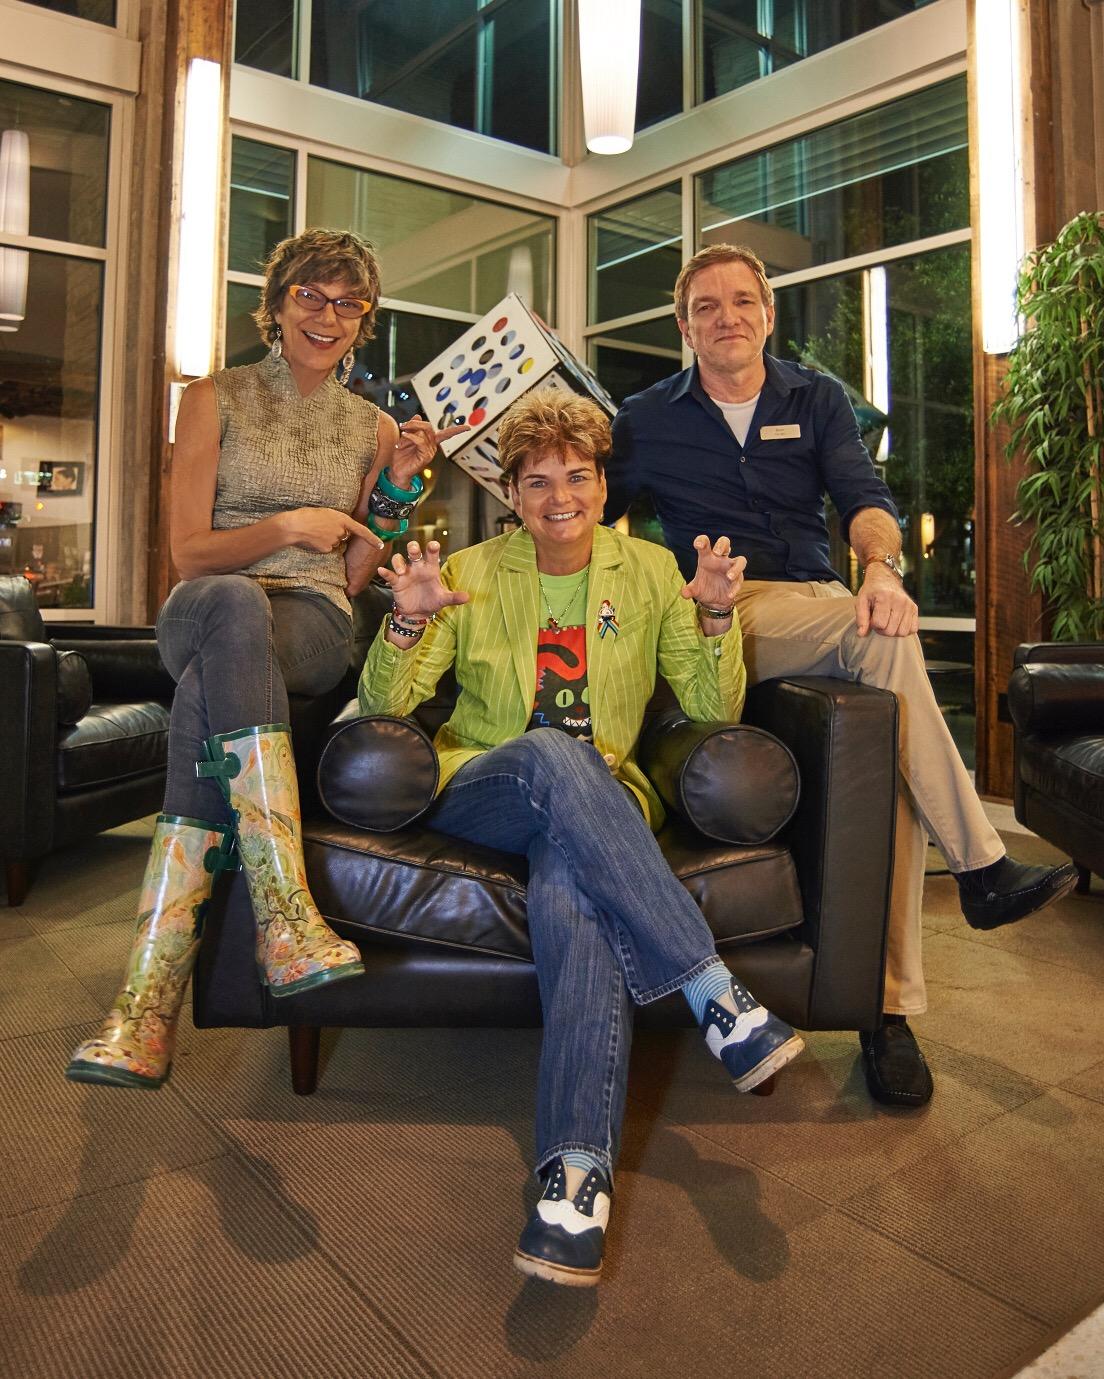 Boris, Marla, and Patty Sheehan